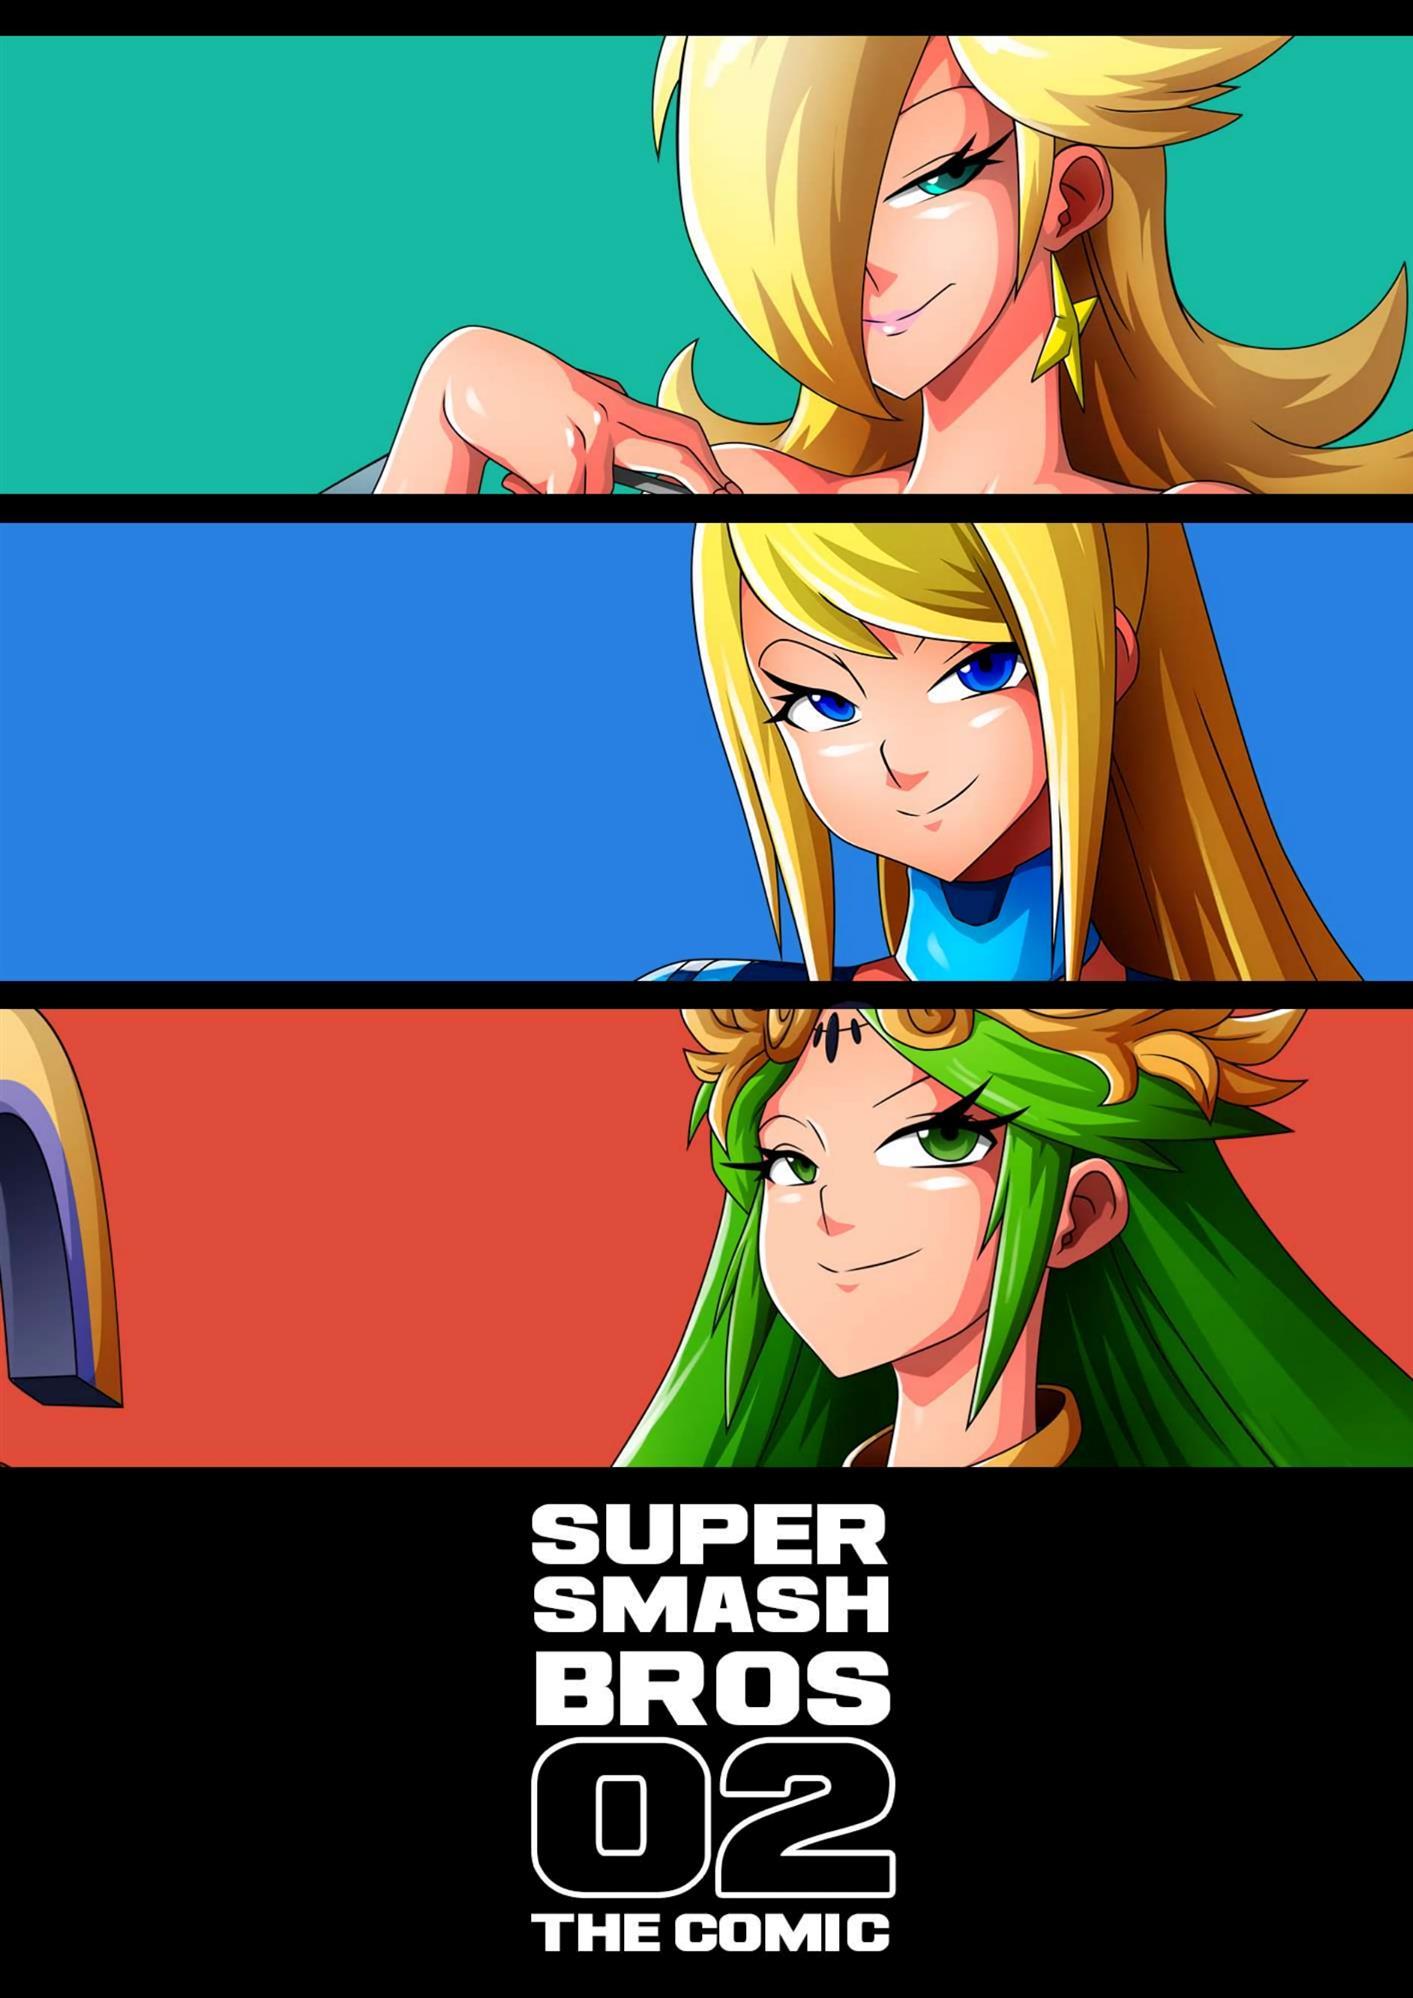 Super Smash Bros 02